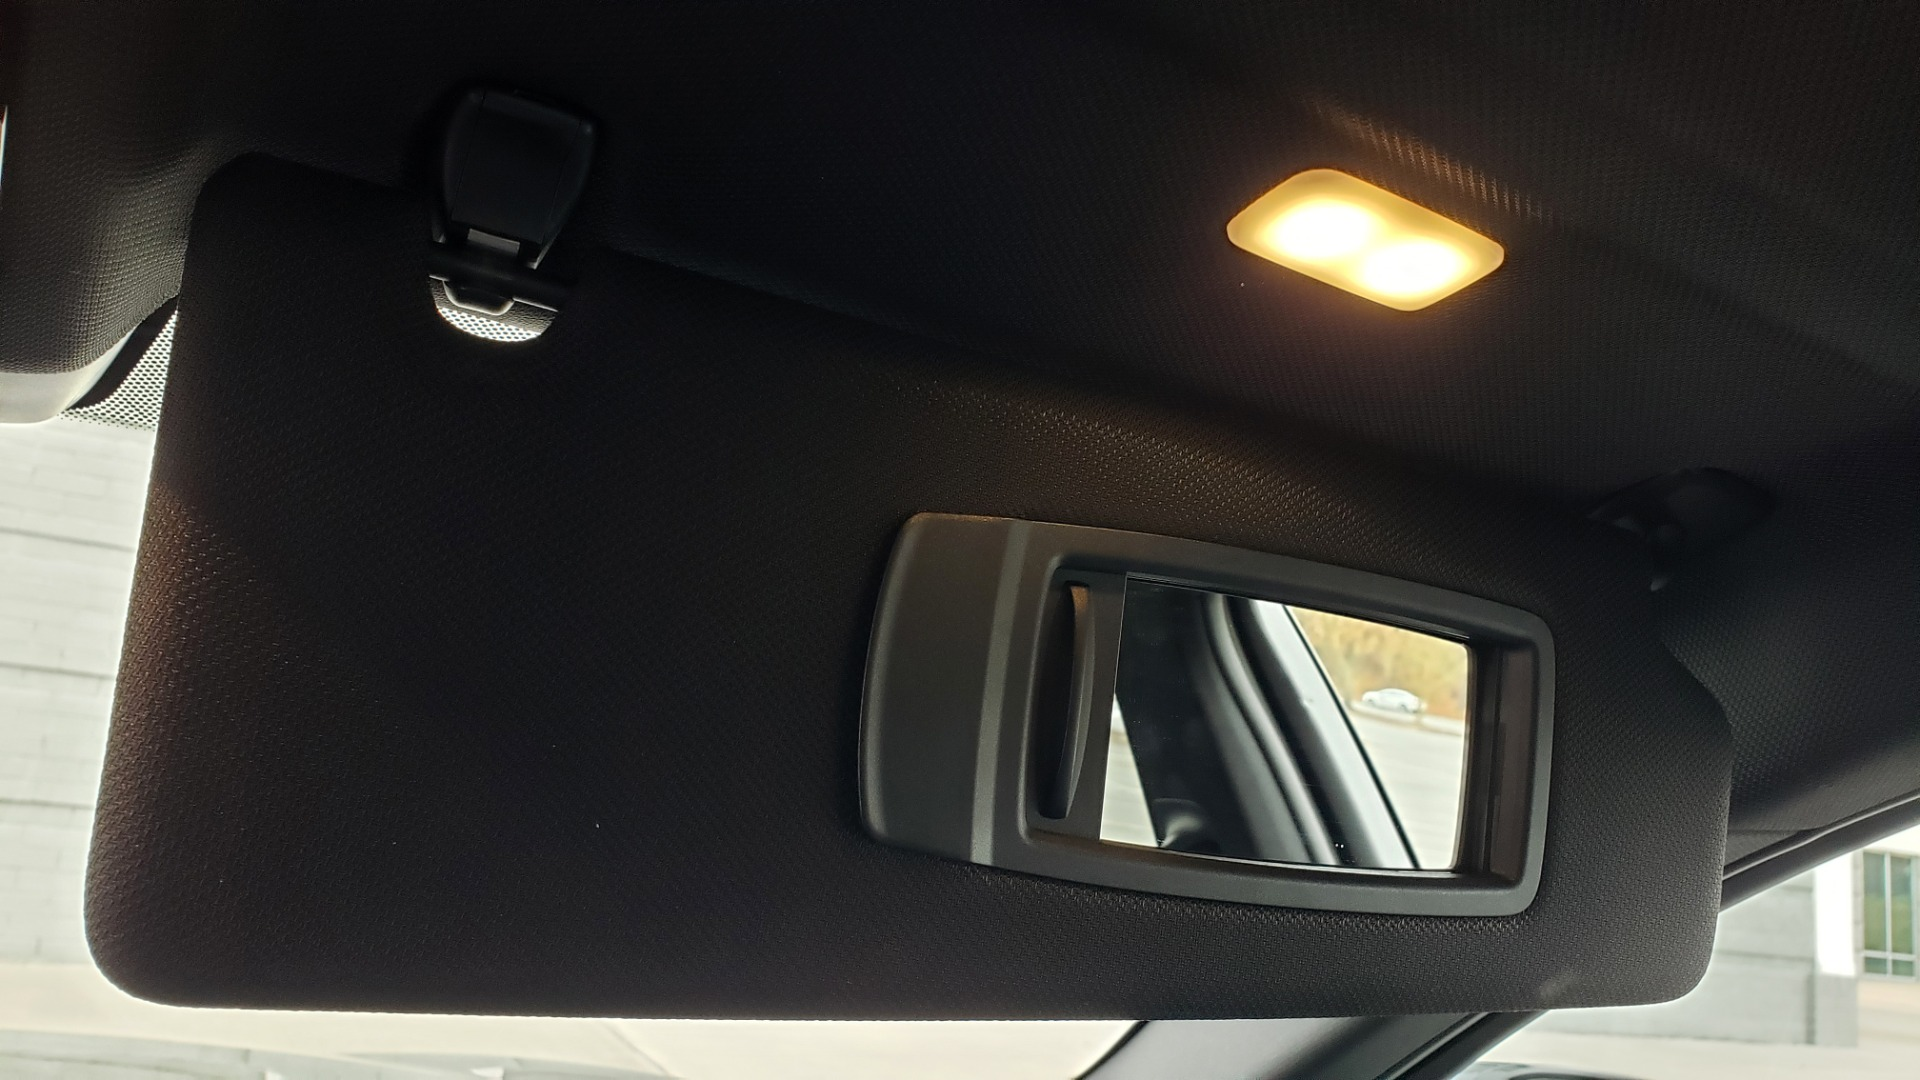 Used 2017 BMW 5 SERIES 530IXDRIVE / PREM PKG / DRVR ASST PLUS / CLD WTHR / APPLE CARPLAY for sale Sold at Formula Imports in Charlotte NC 28227 53